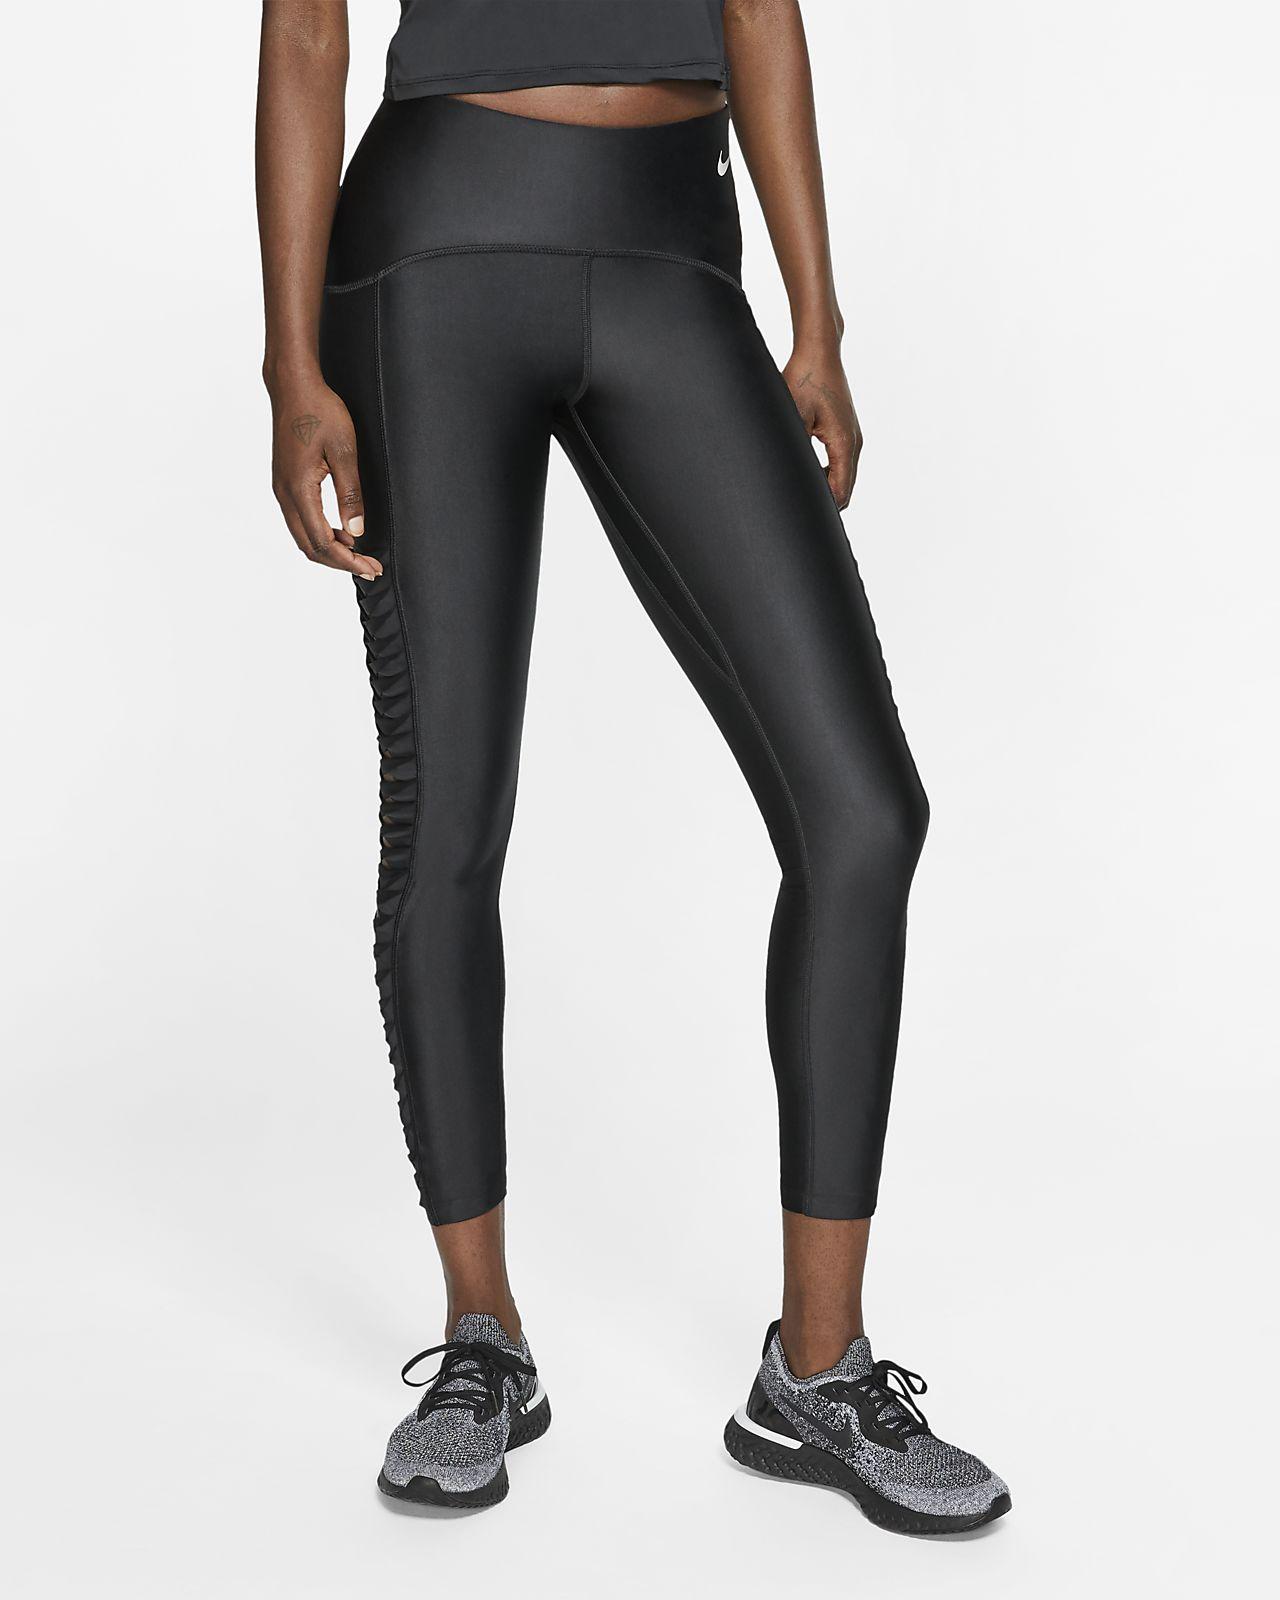 low price sale on feet at competitive price Nike Speed 7/8-Lauf-Tights für Damen